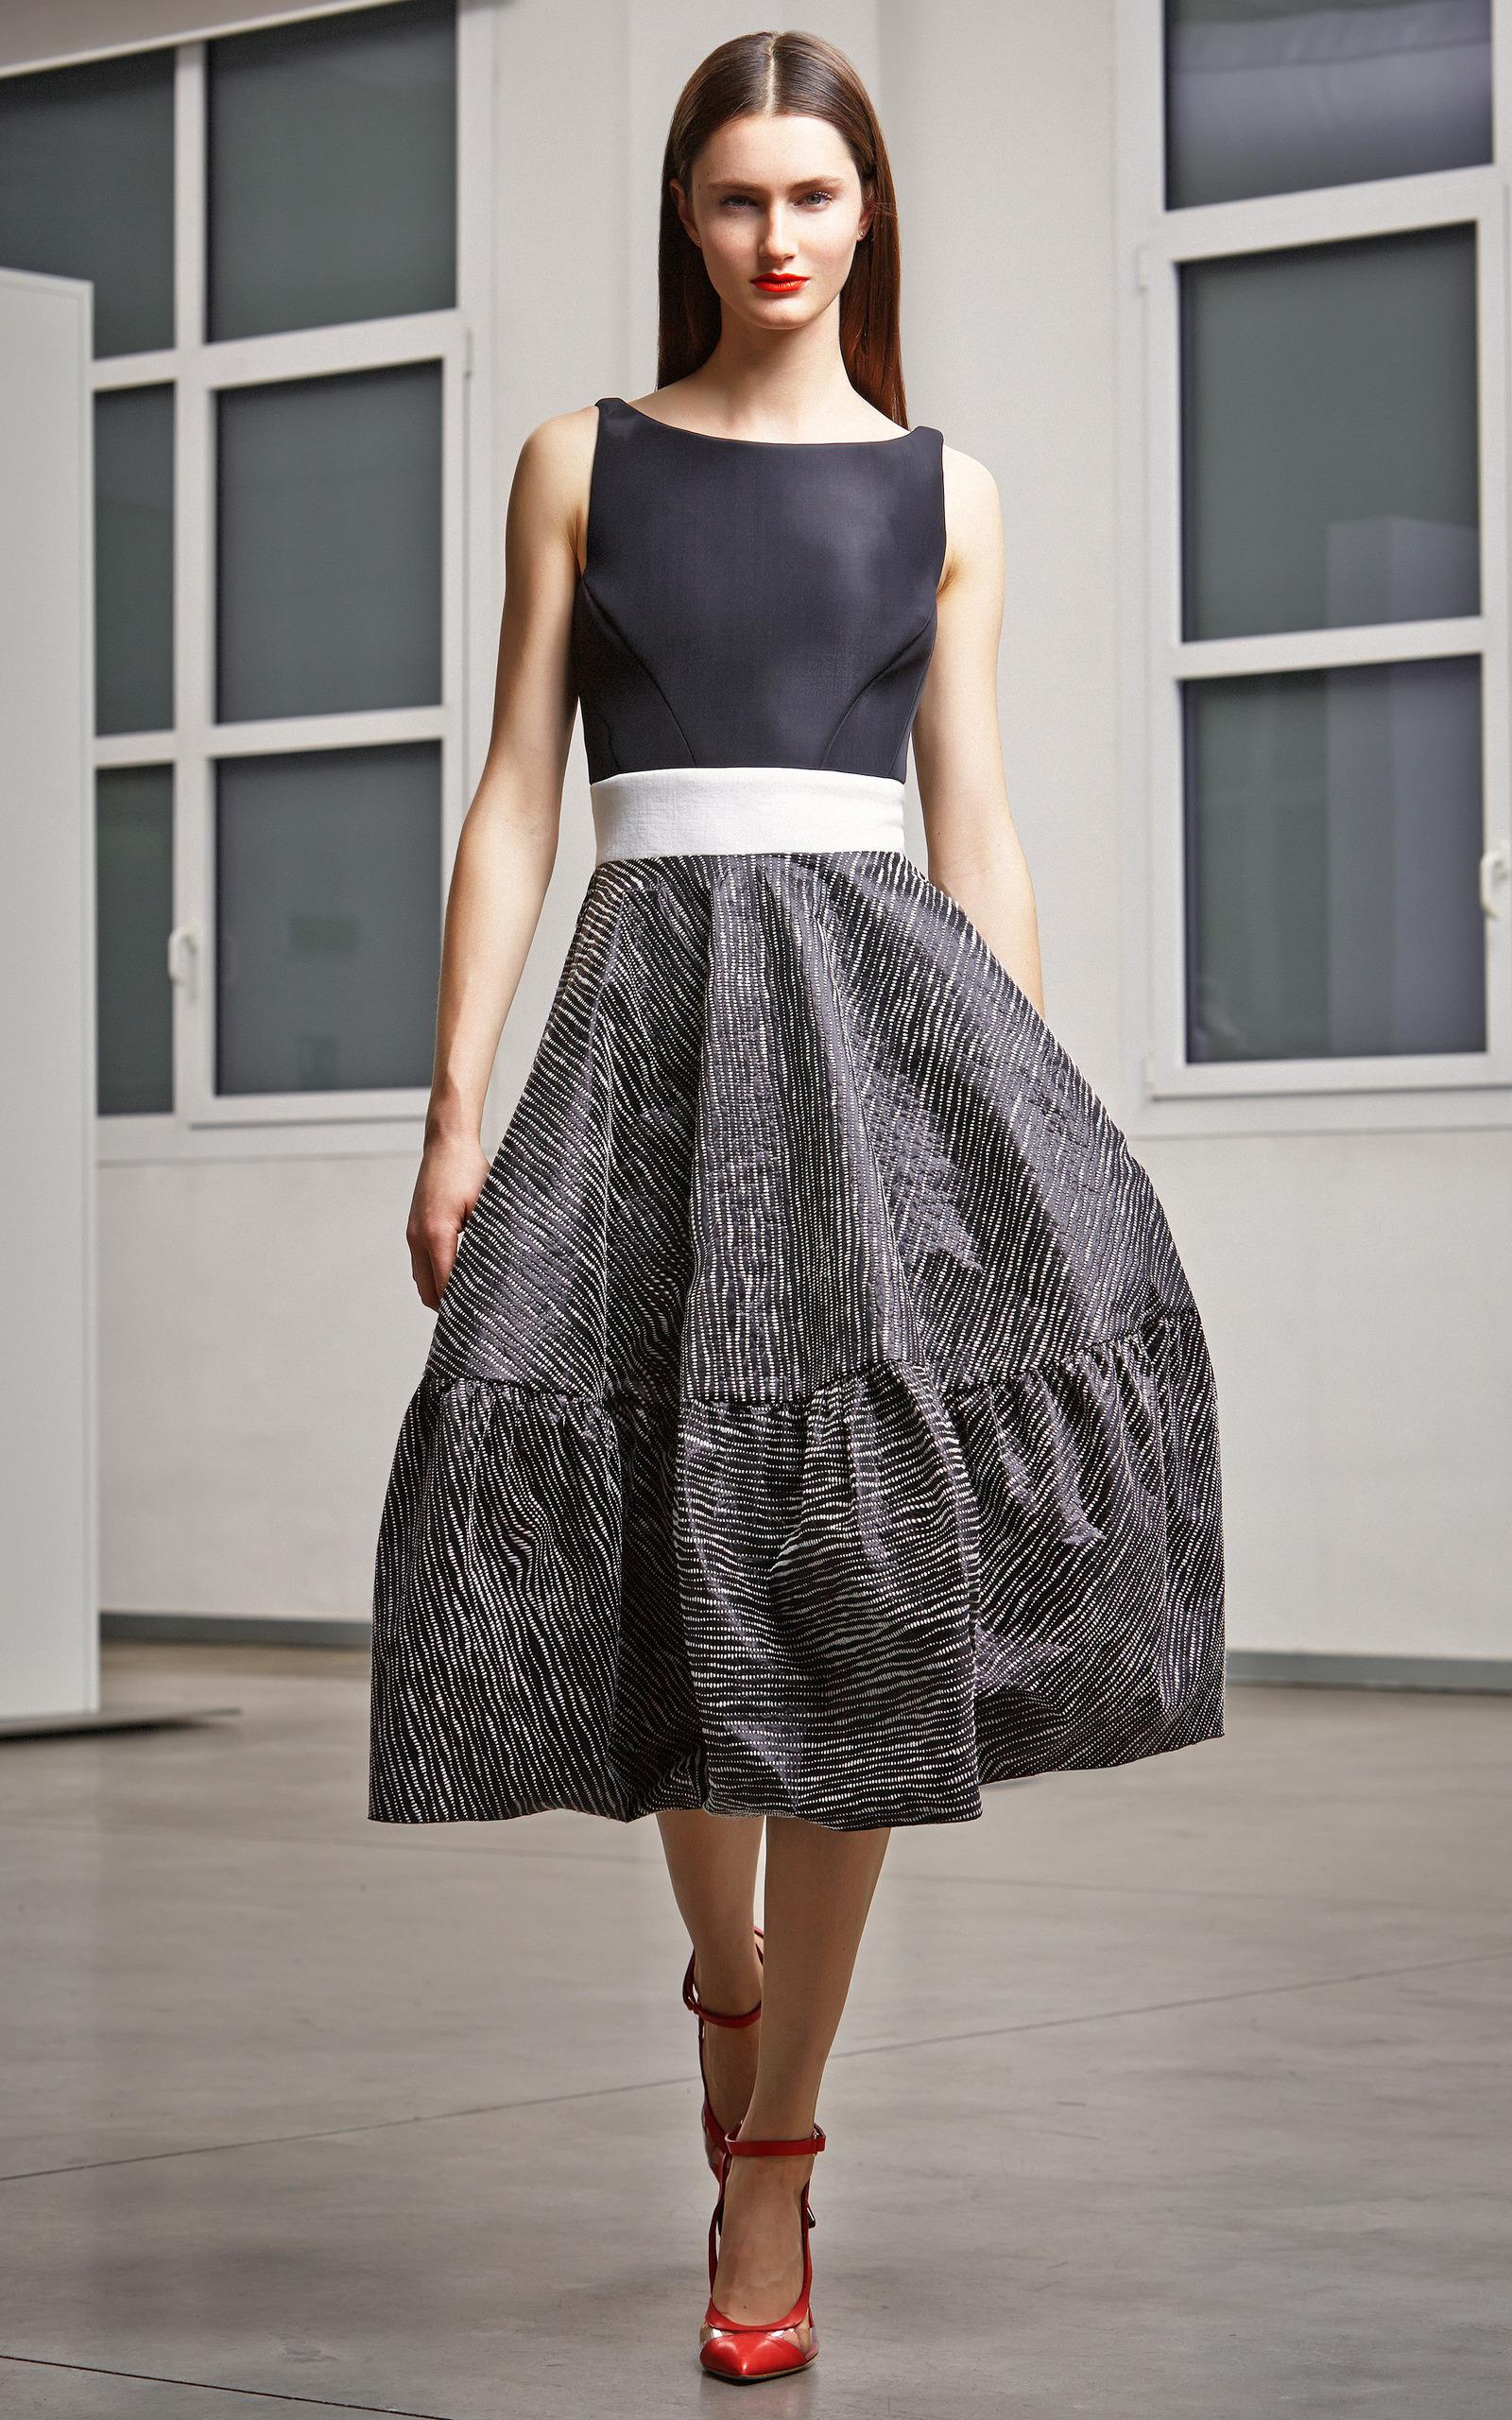 Color-Blocked Full Skirt Cocktail Dress by Antonio | Moda Operandi